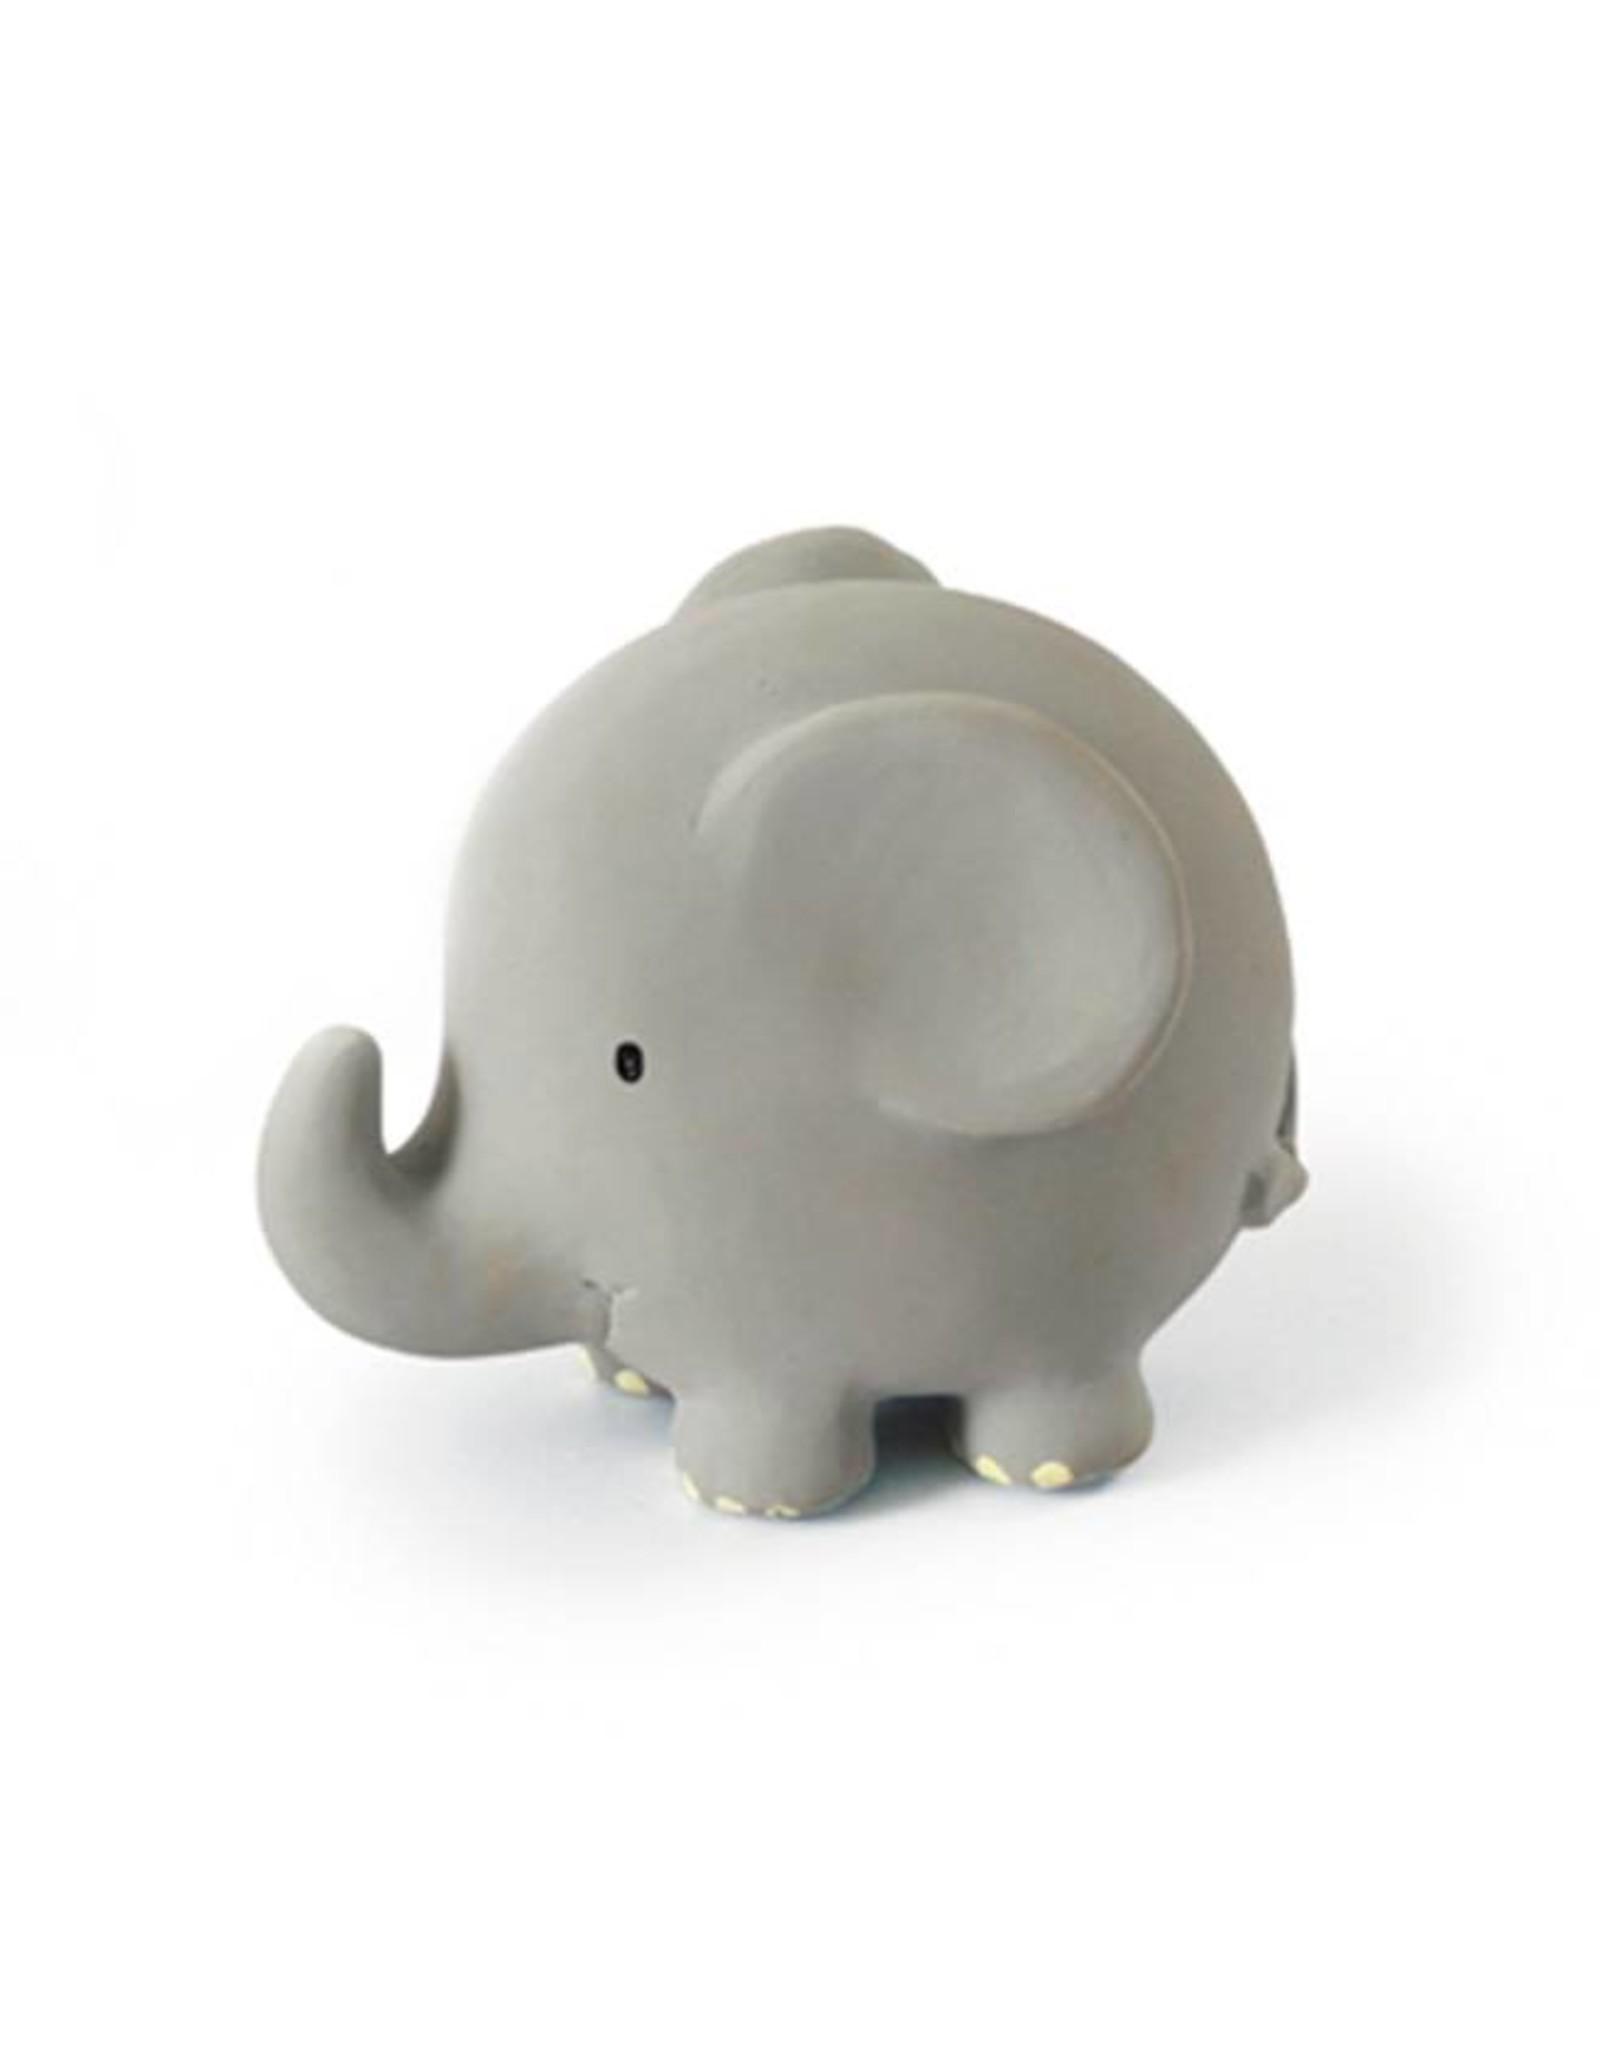 Tikiri Badspeeltje Safari met belletje-olifant